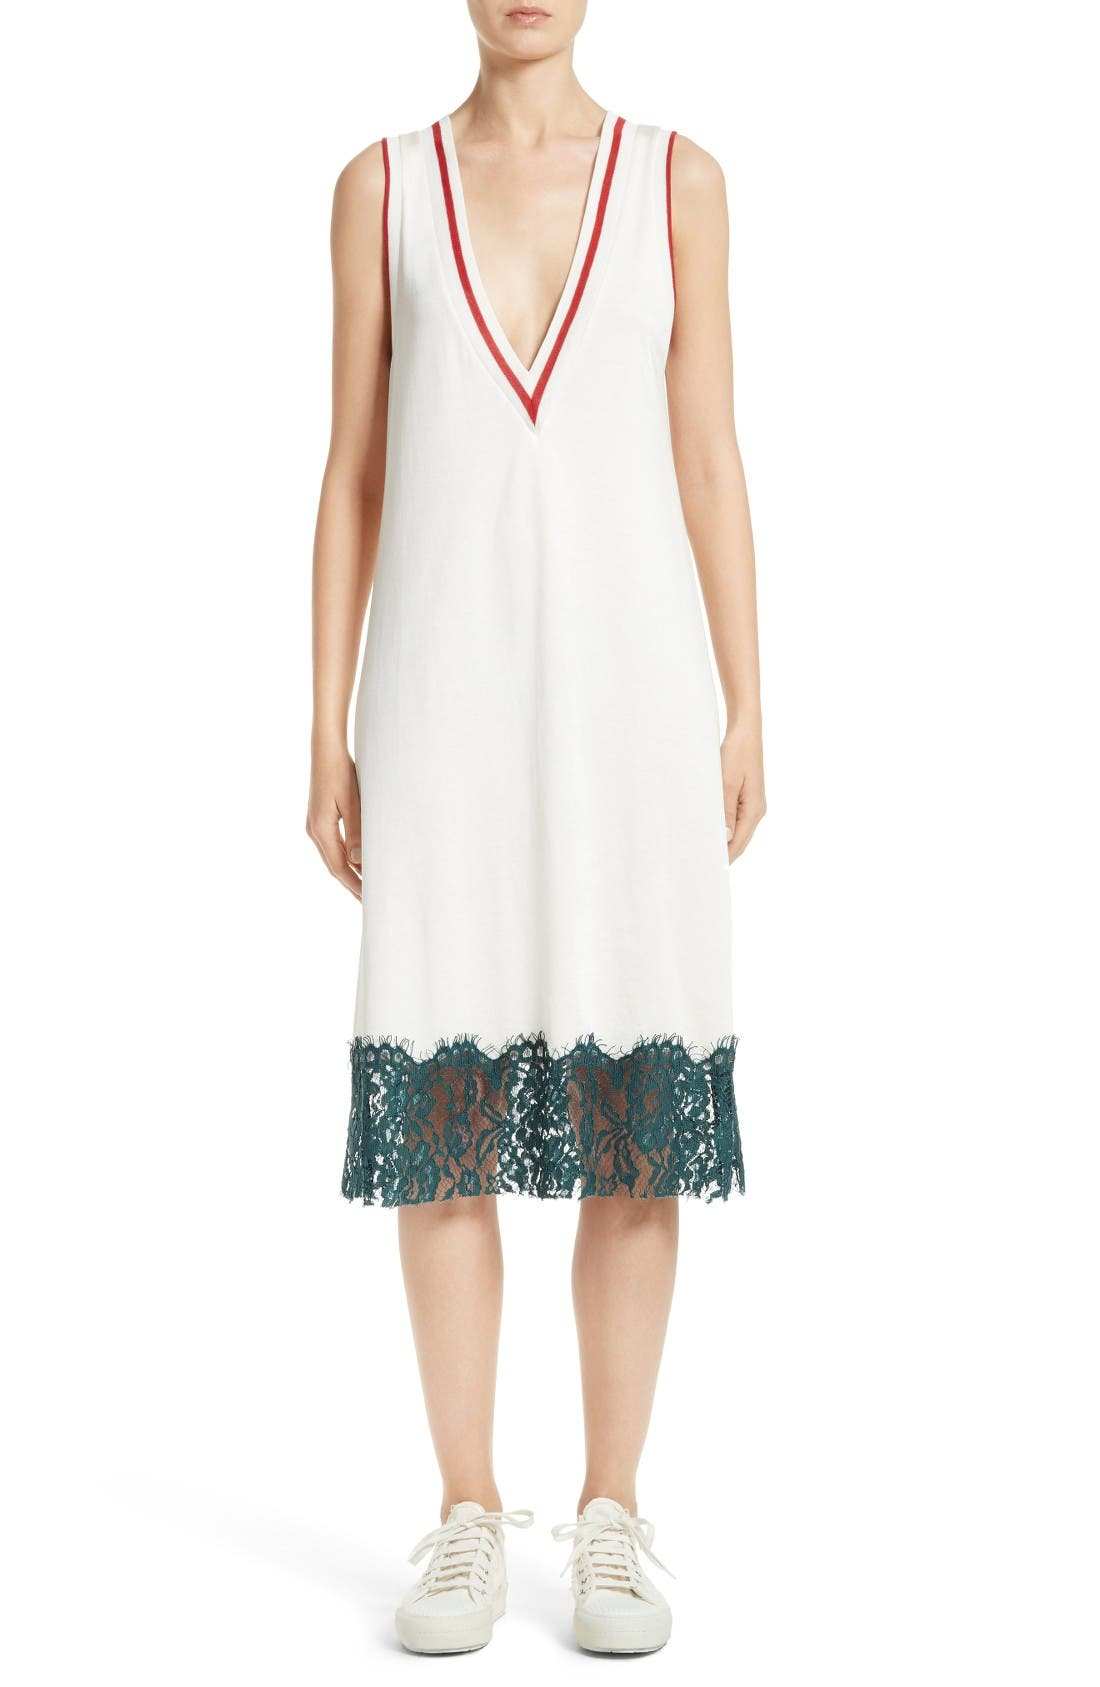 MM6 MAISON MARGIELA Varsity Dress